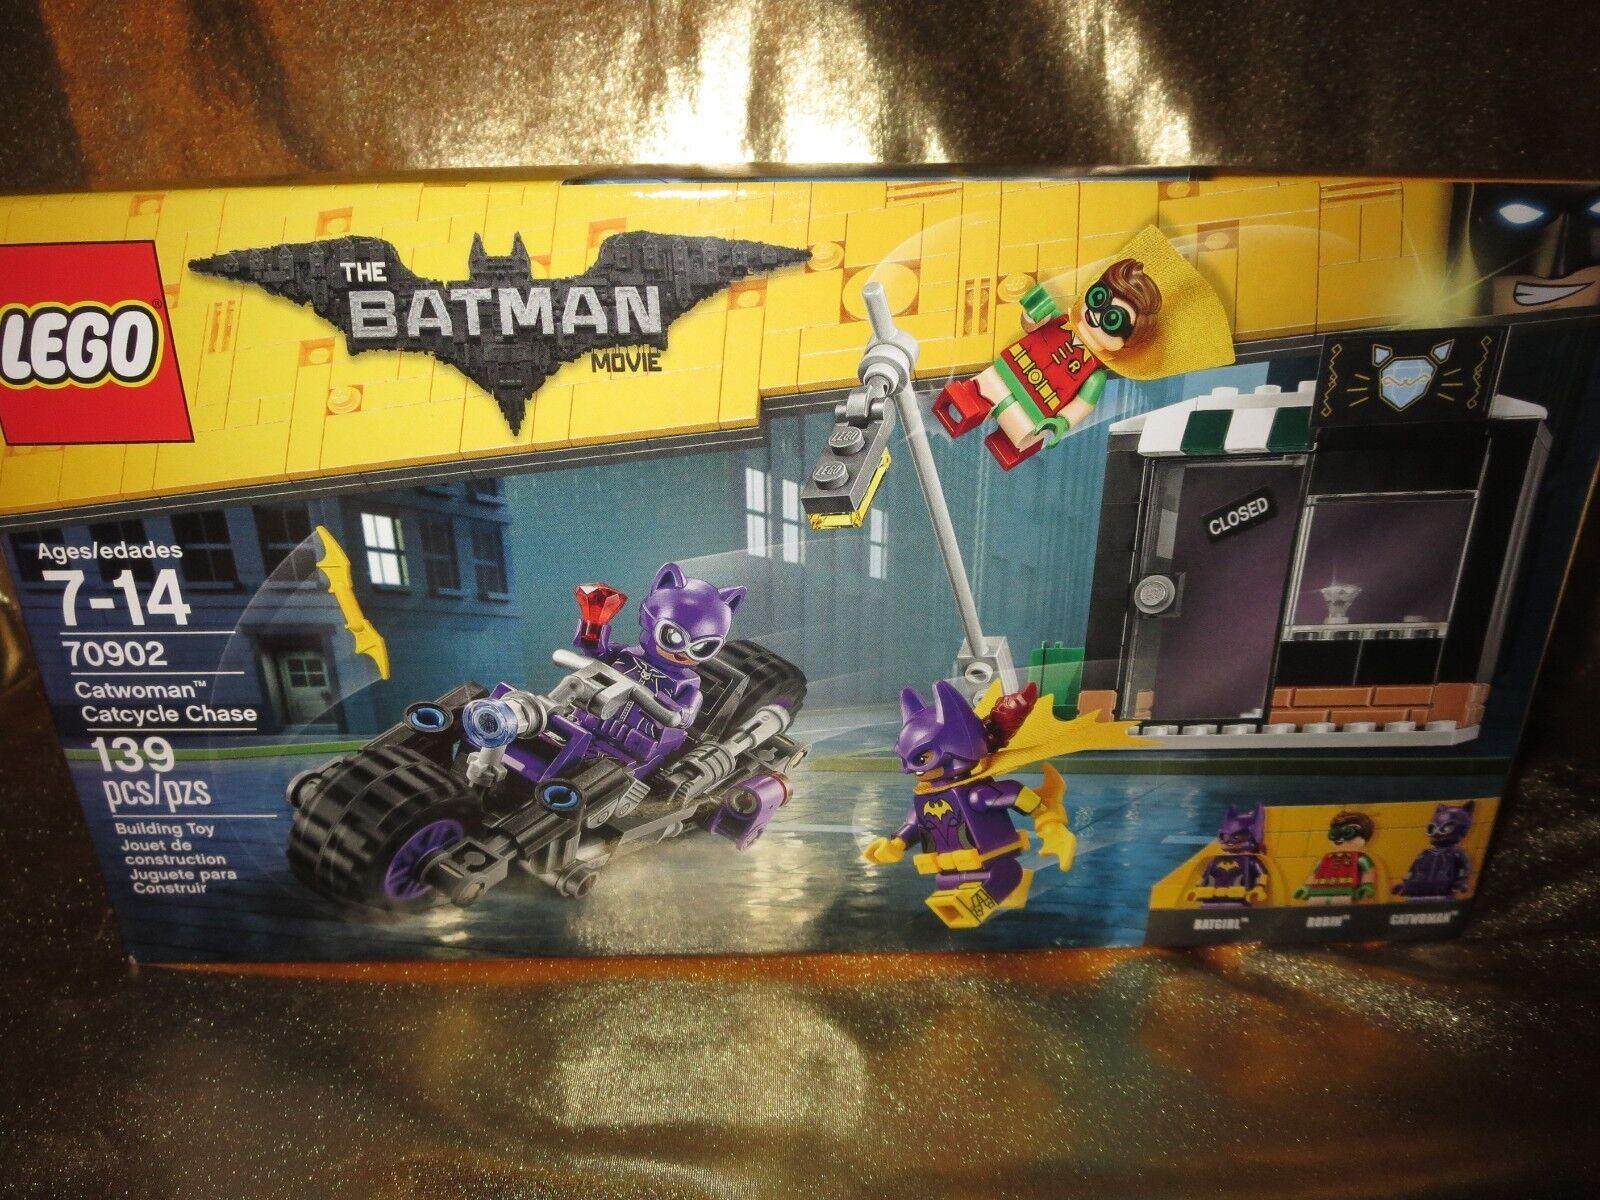 The Batman Movie Catwoman Catcycle- Chase LEGO Set 139pcs 70902 NEW